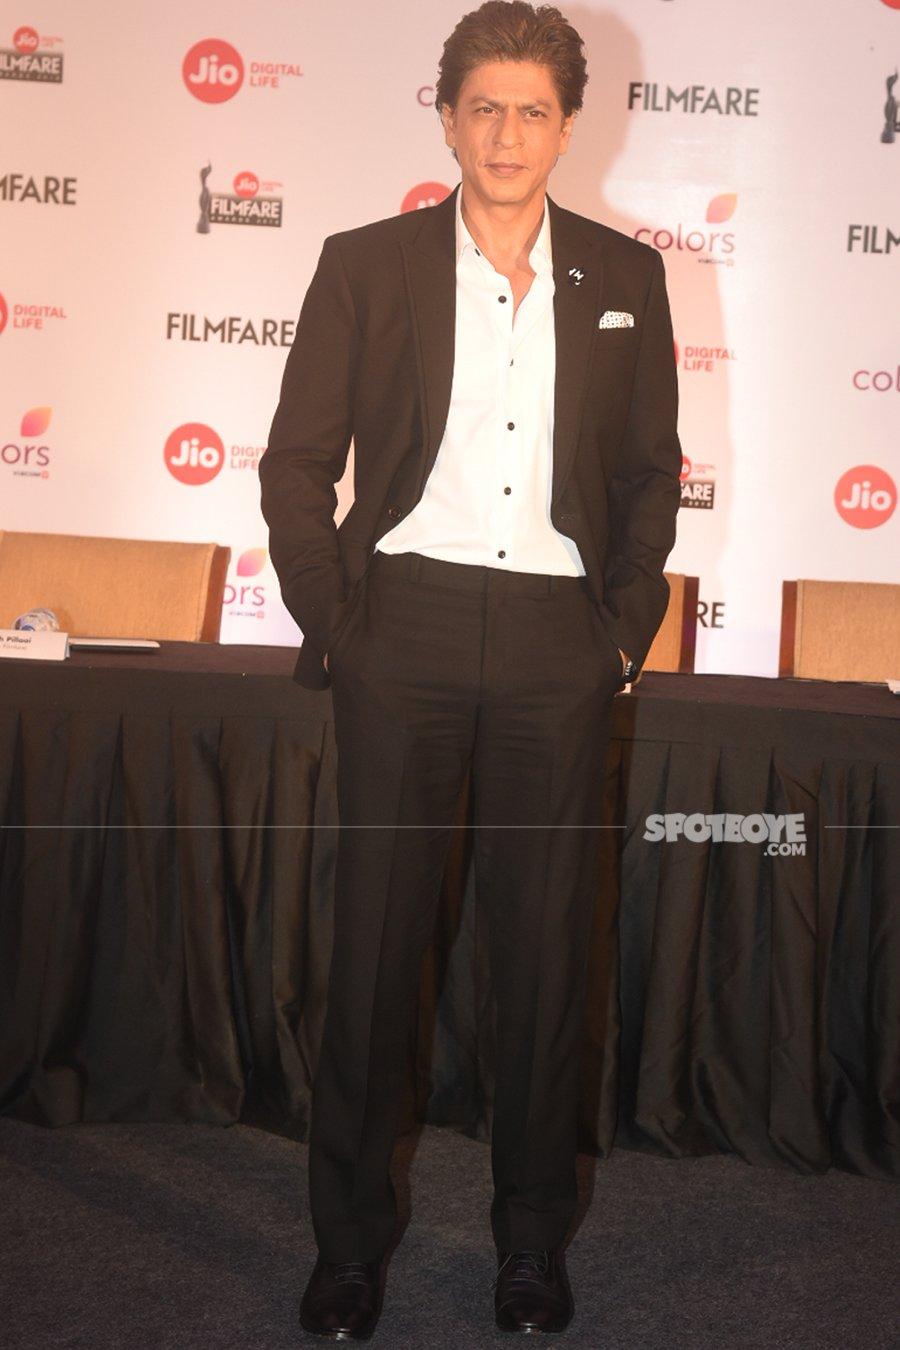 shah rukh khan at filmfare awards date announcement media meet